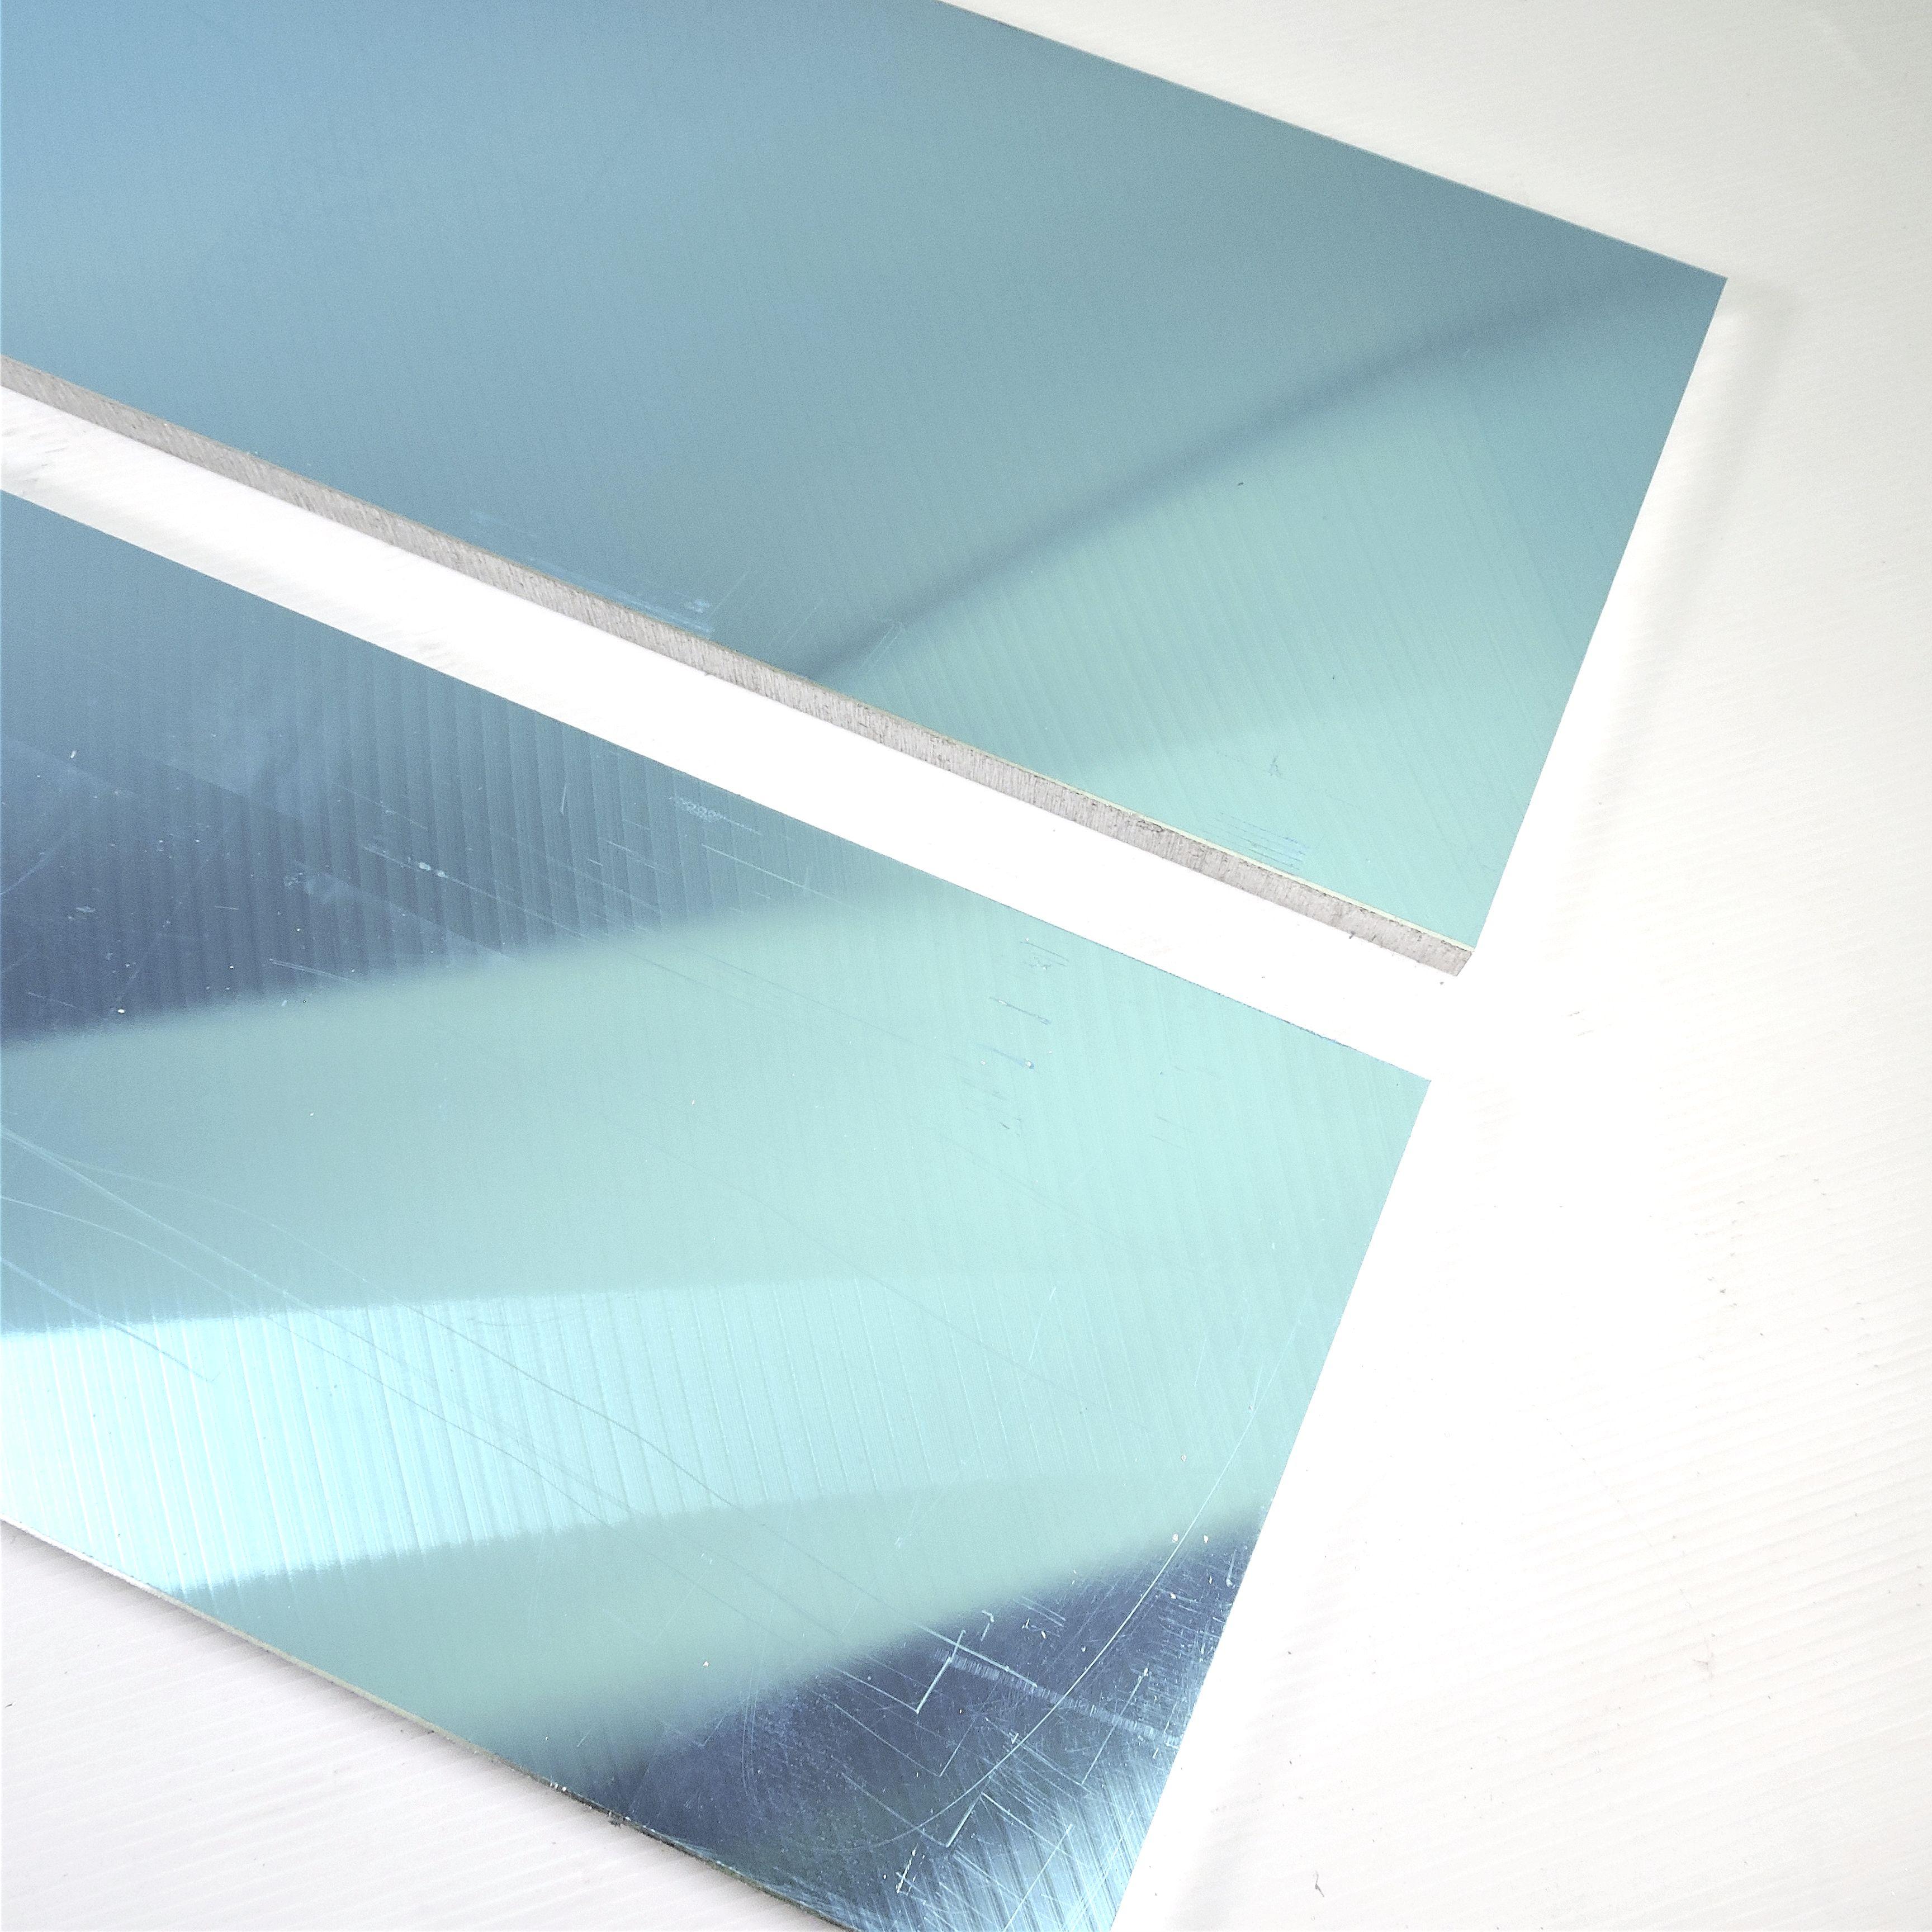 ".25/"" thick 1//4 Precision CAST Aluminum PLATE 9.125/""x 11/"" Long QTY 3 sku136610"